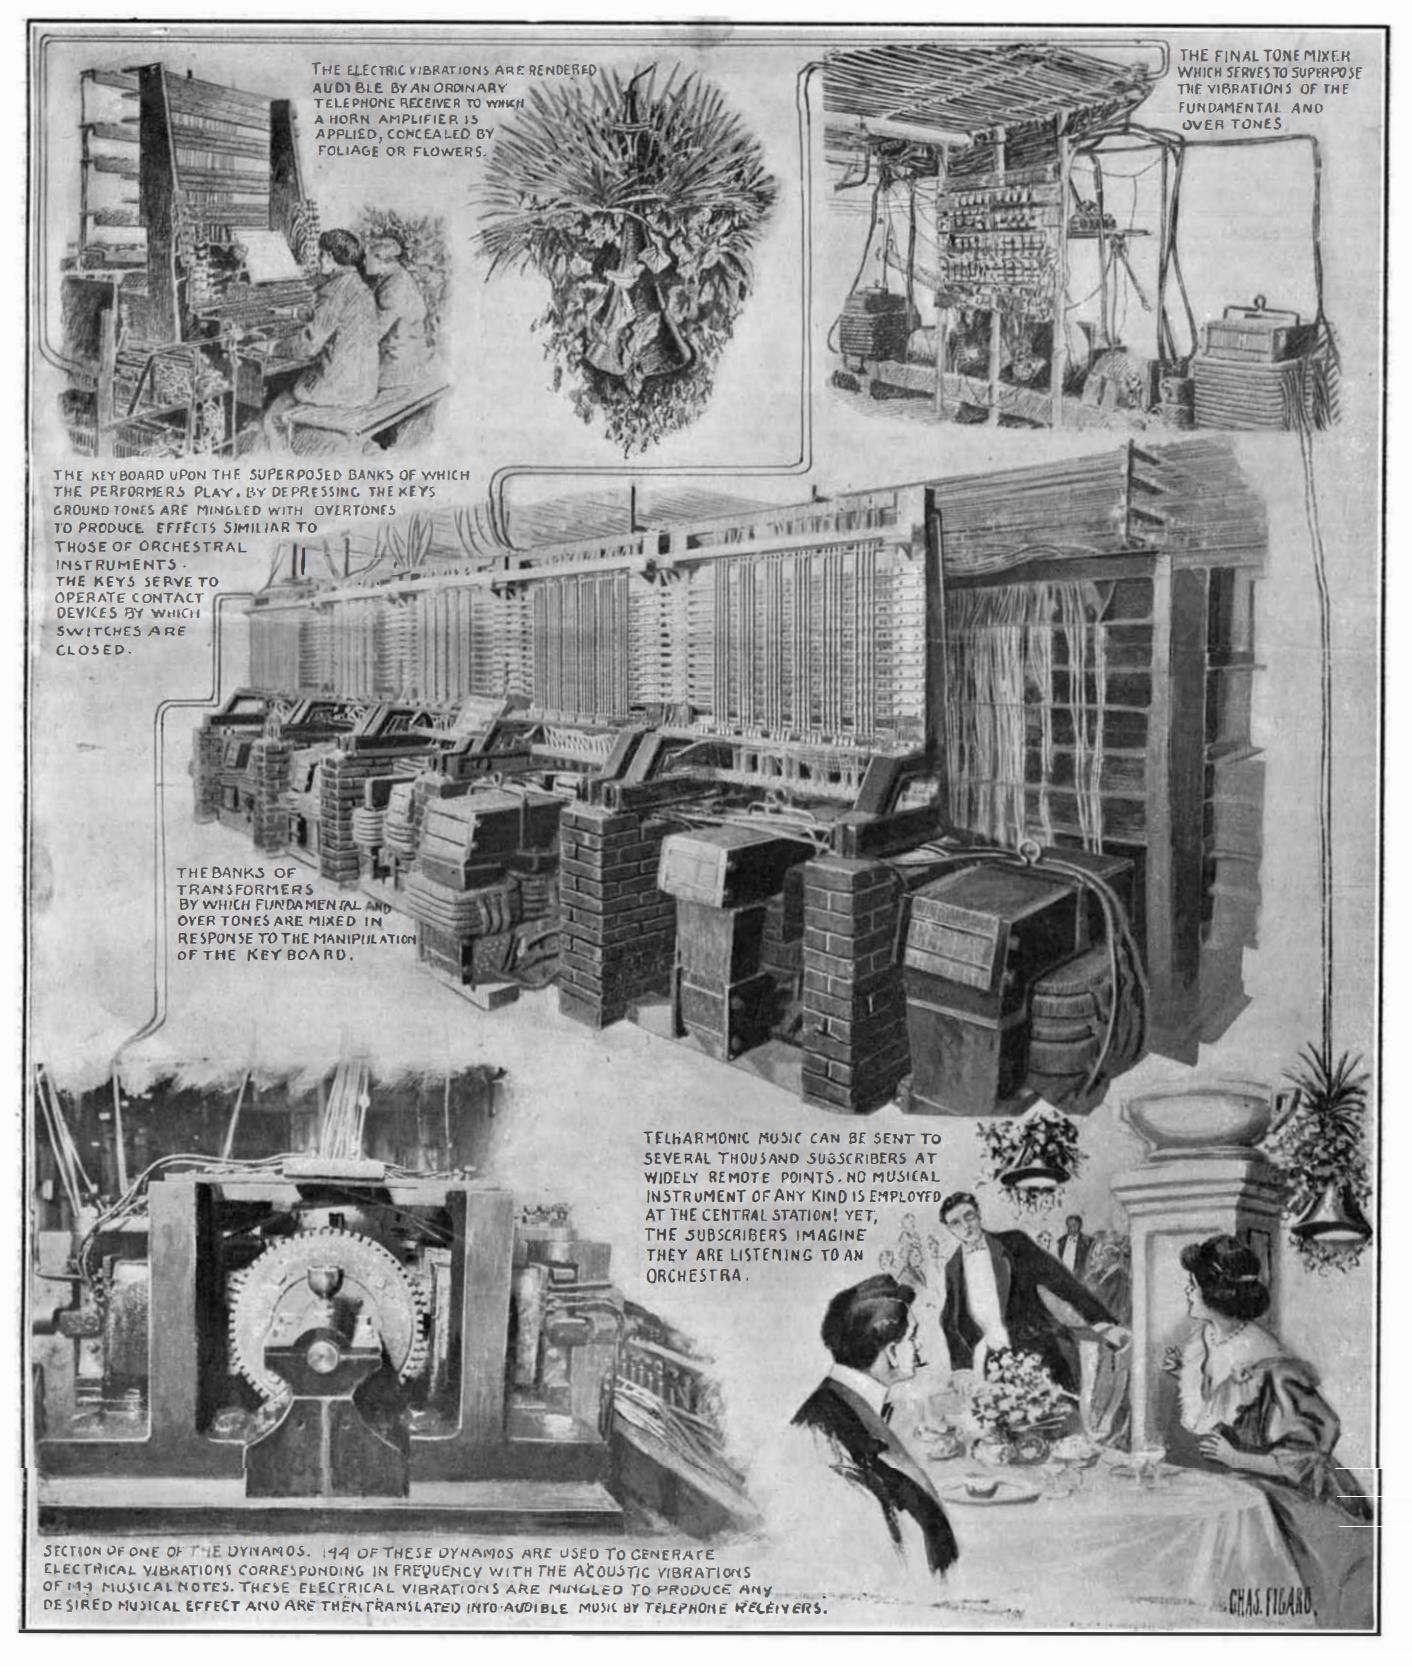 Titelbild Scientific American, Volume 96, Nummer 10, 1907, via archive.org)